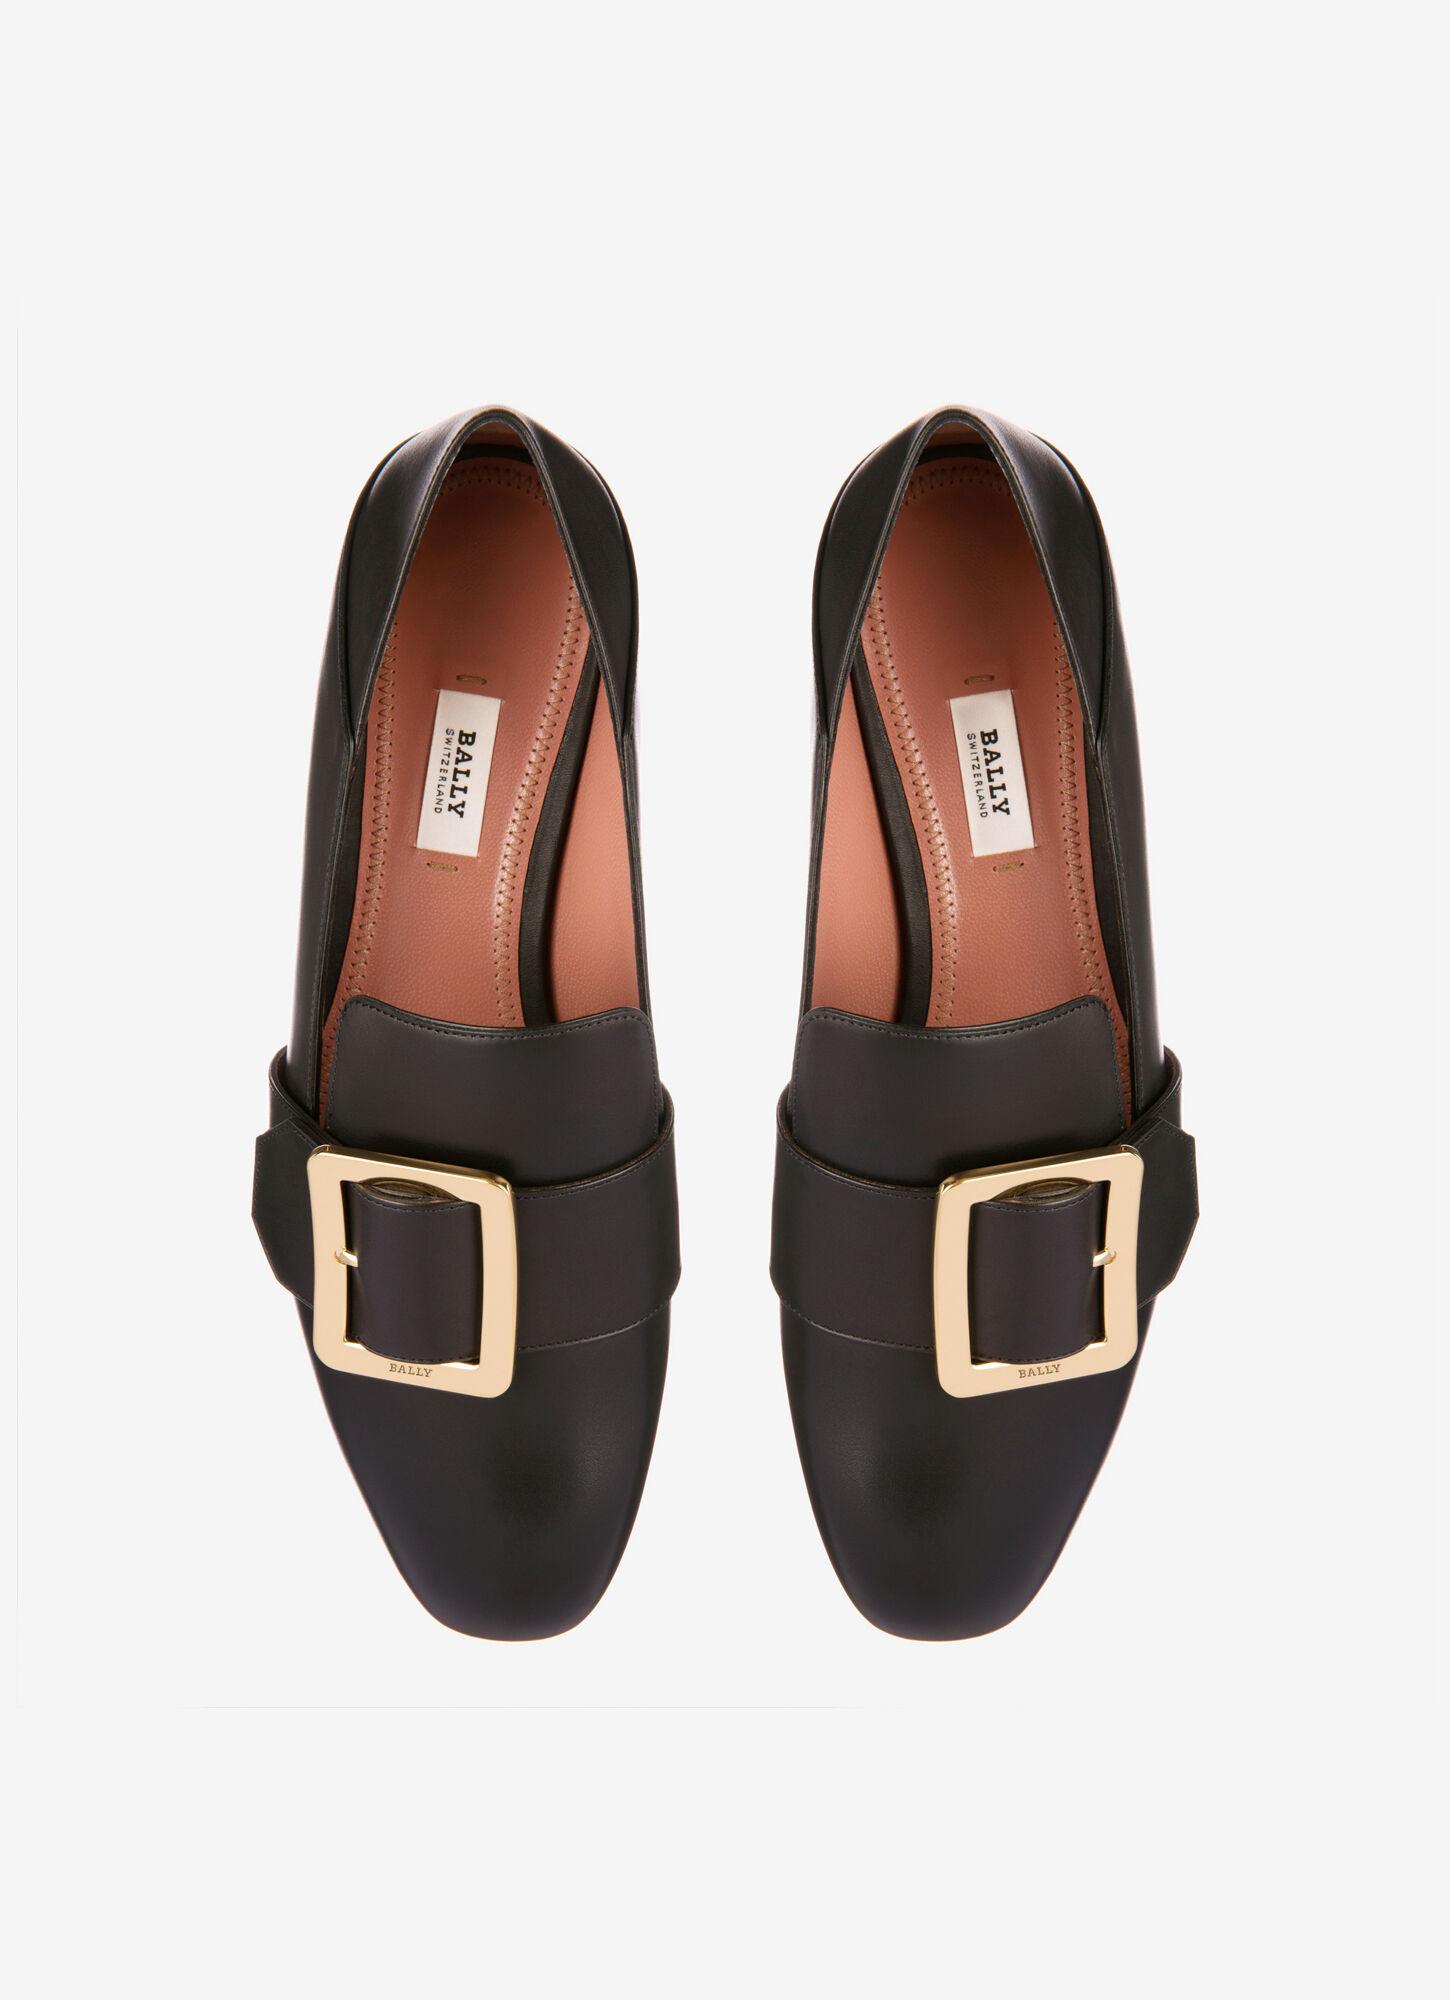 JANELLE | Women's Flats | Bally